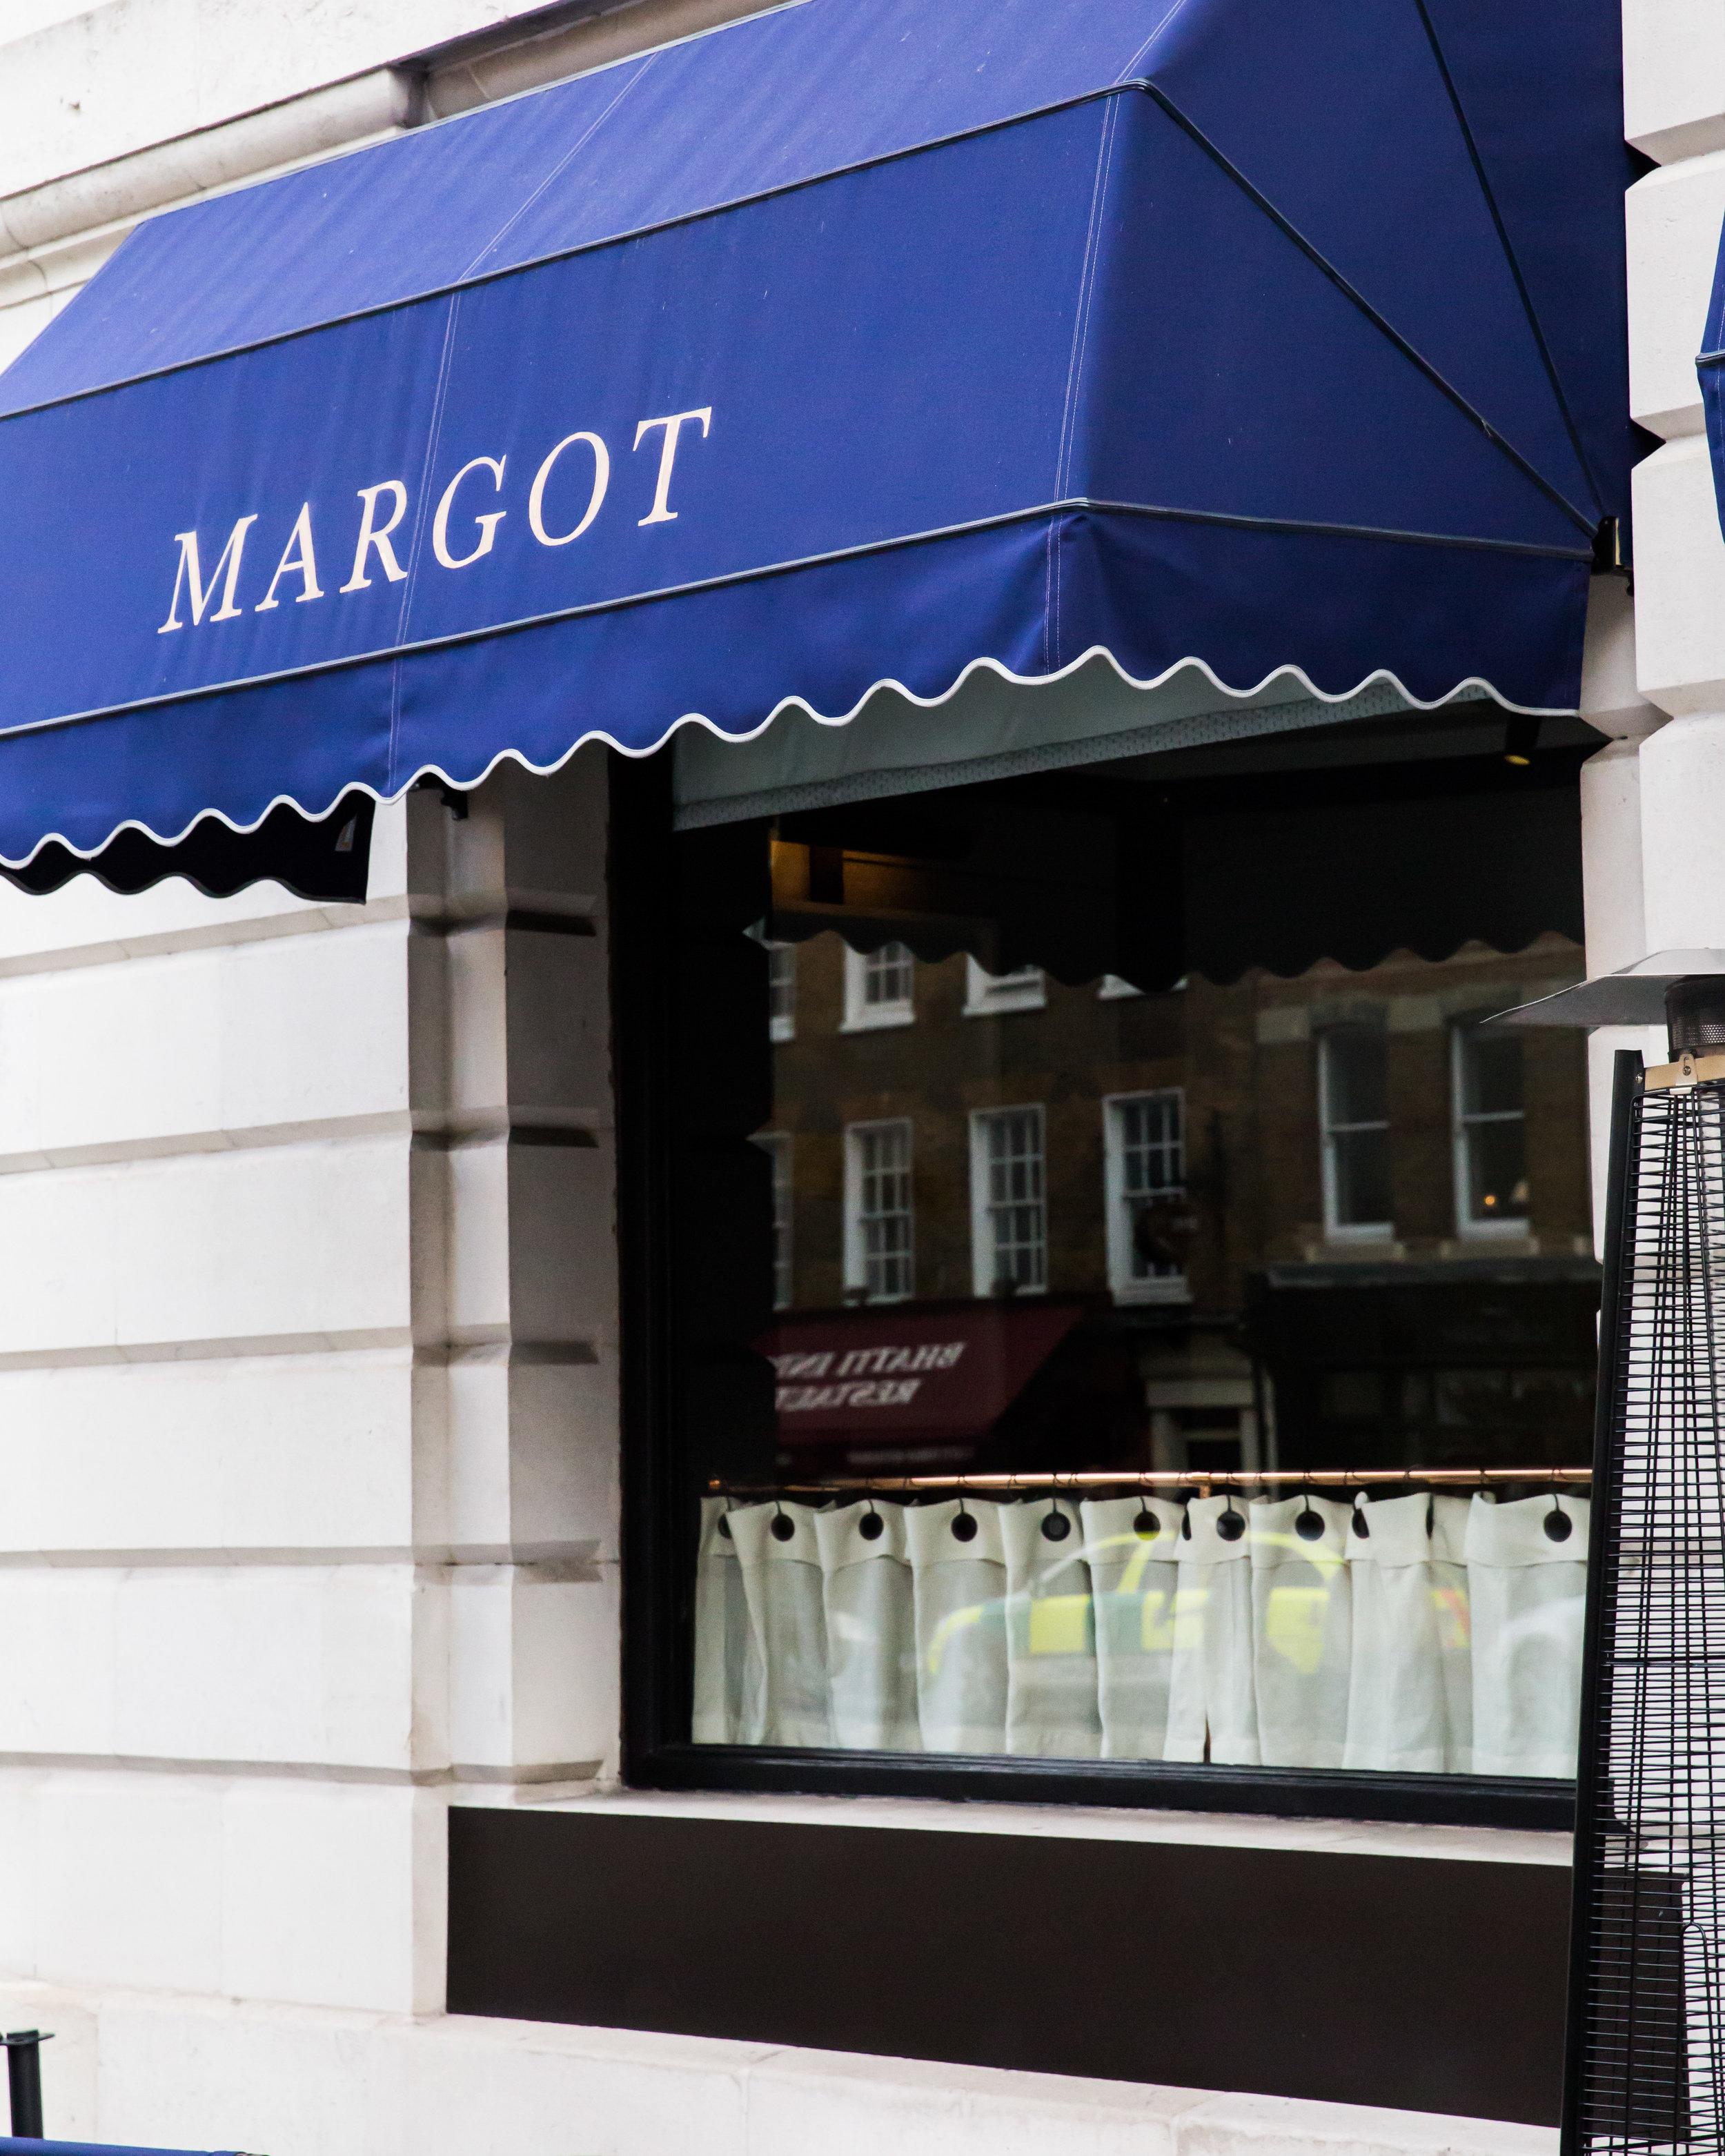 MARGOT-8955.jpg